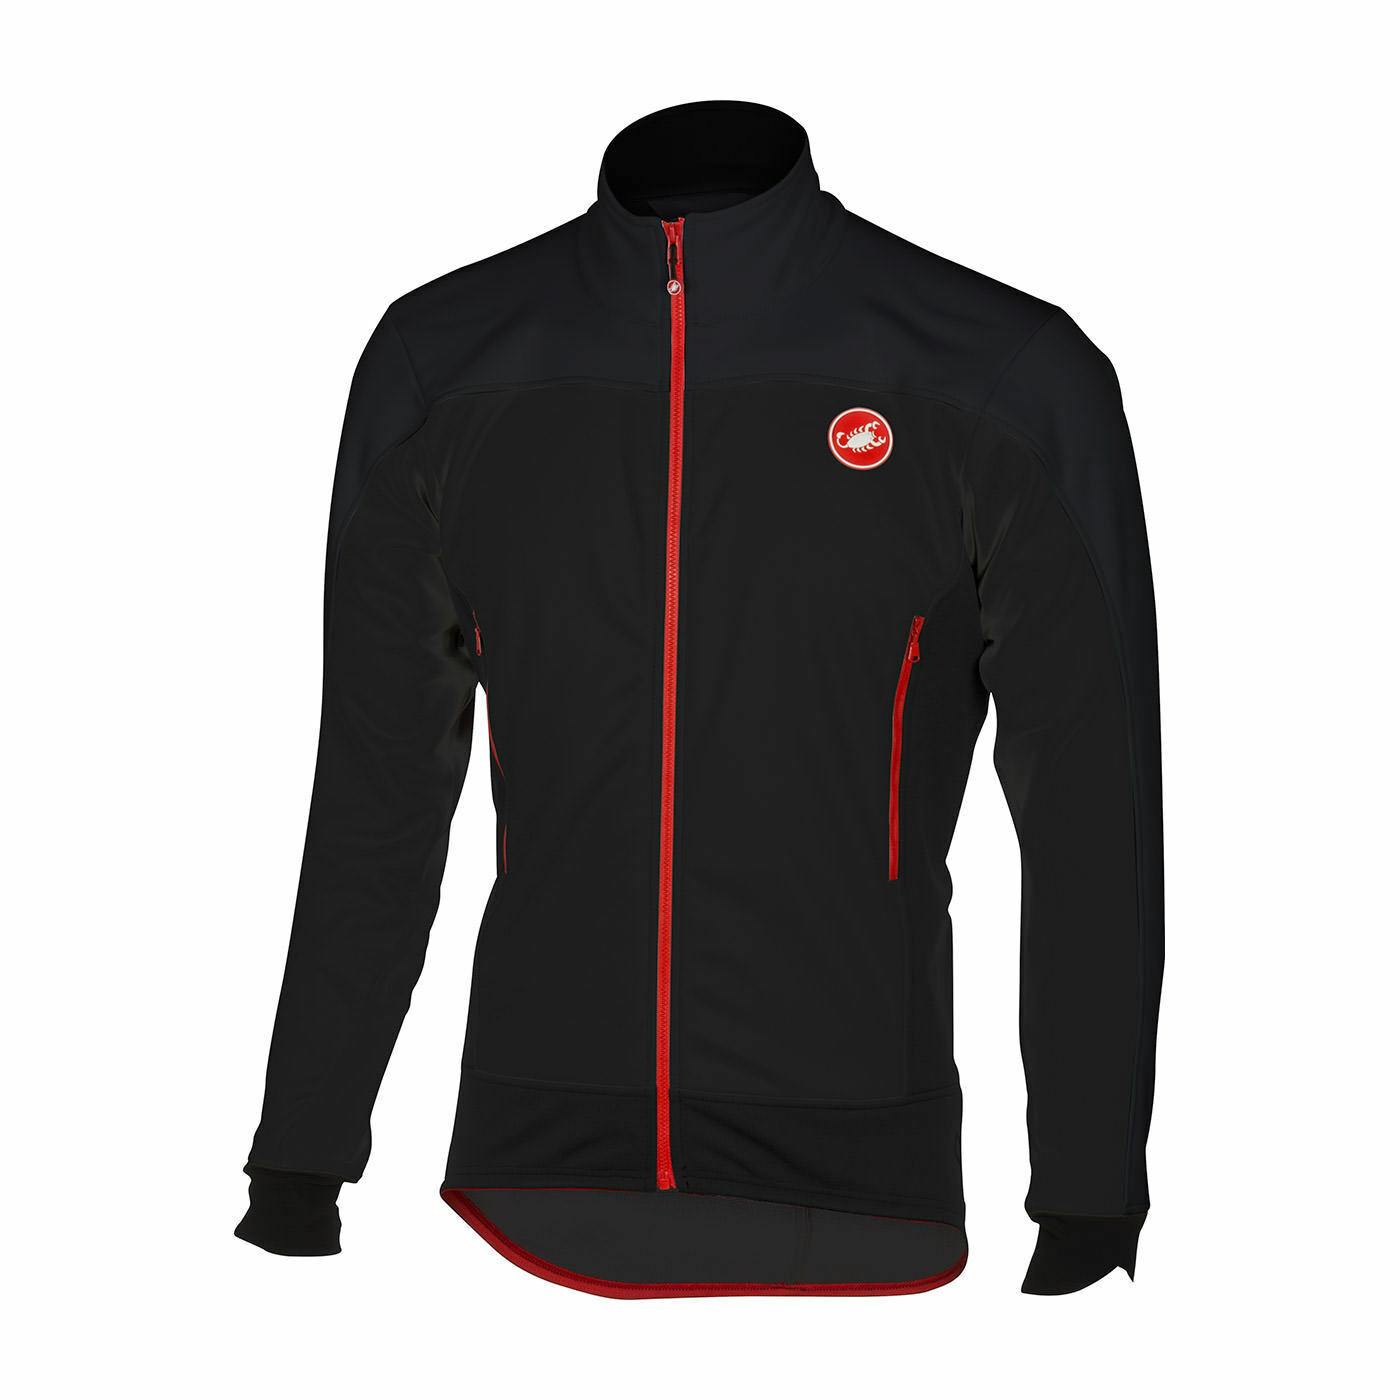 Castelli chaqueta para hombre Mortirolo 4 - 2018